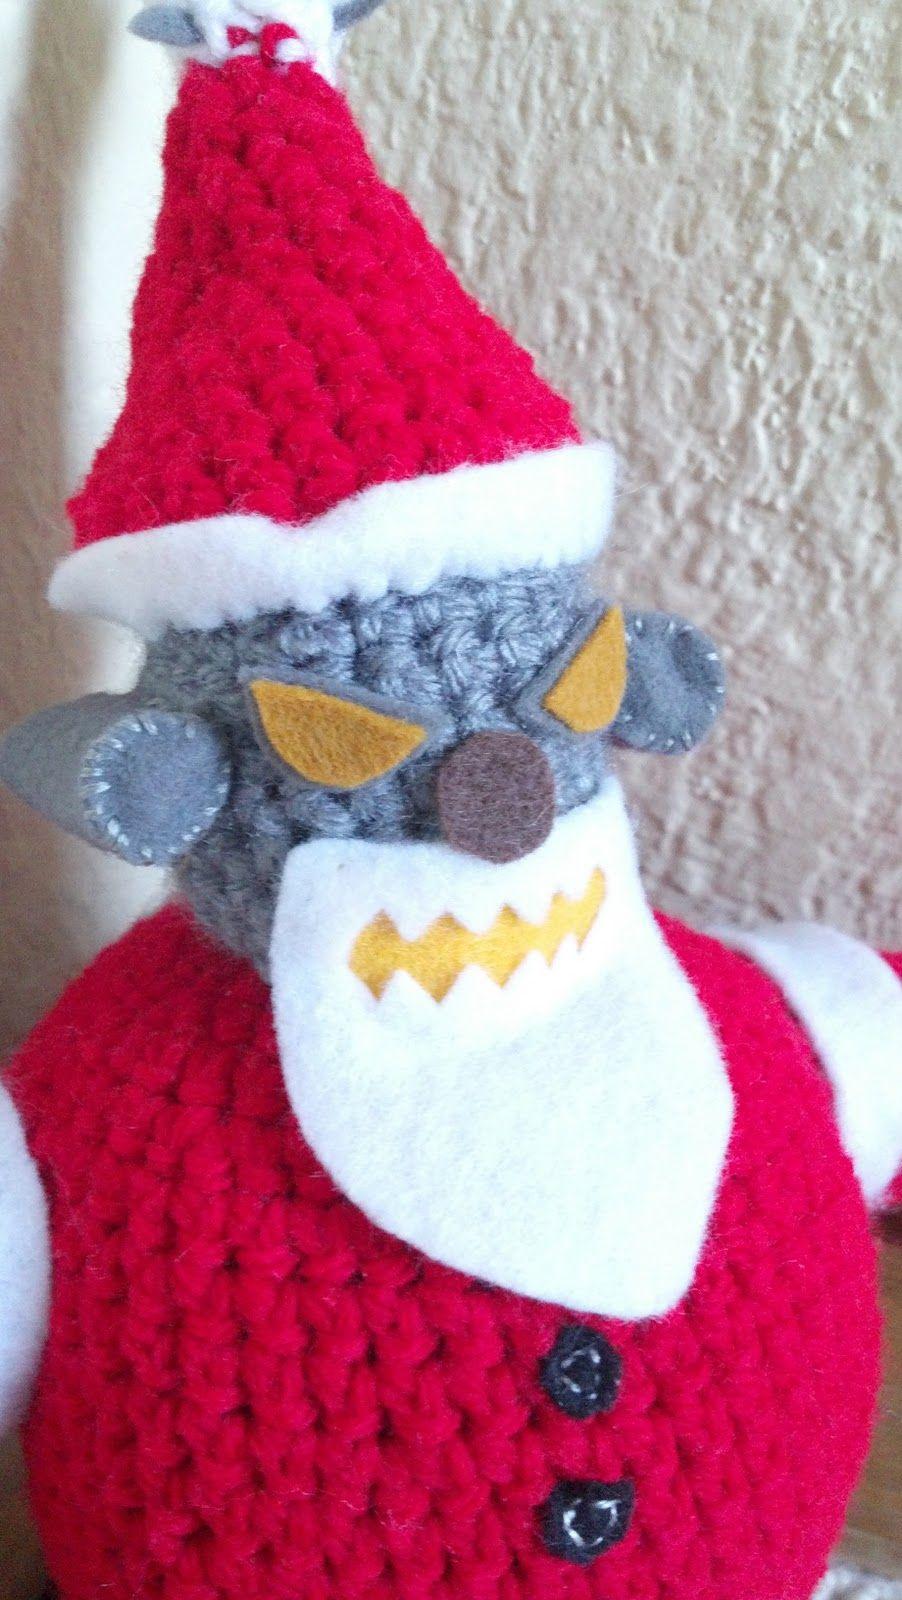 Robat Santa from Futurama. Mostly Nerdy Crochet: \